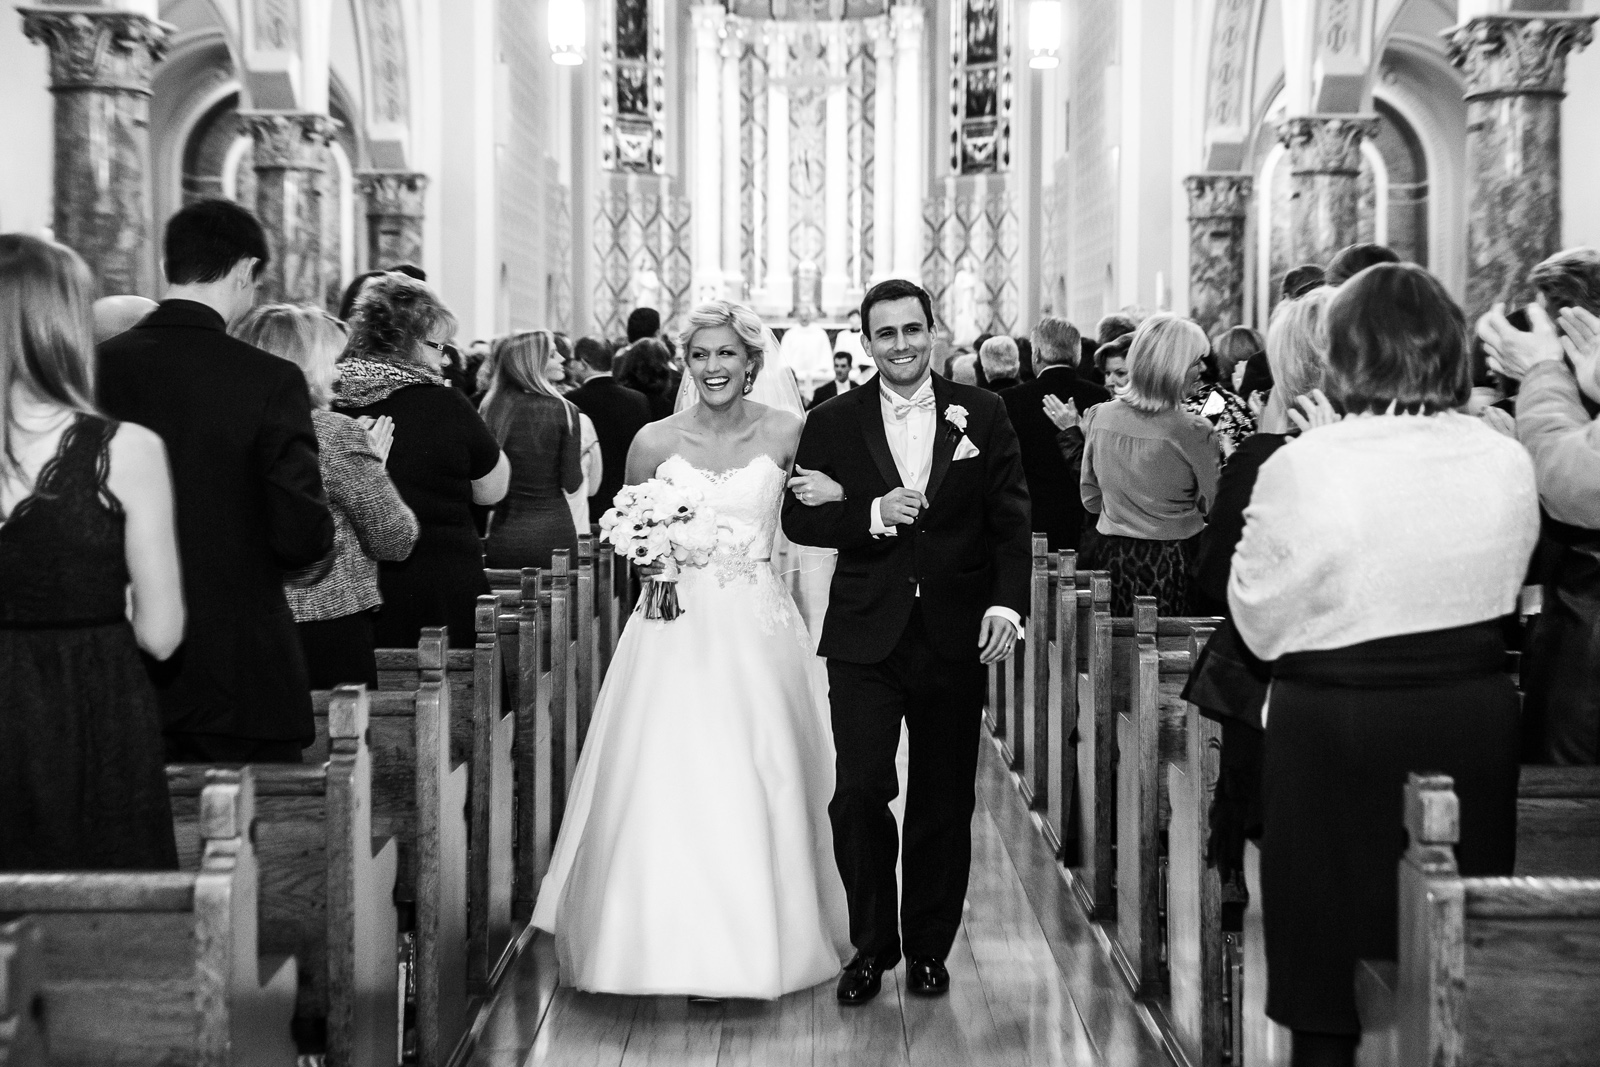 St Ambrose Hll Wedding_20141115_15472025.jpg